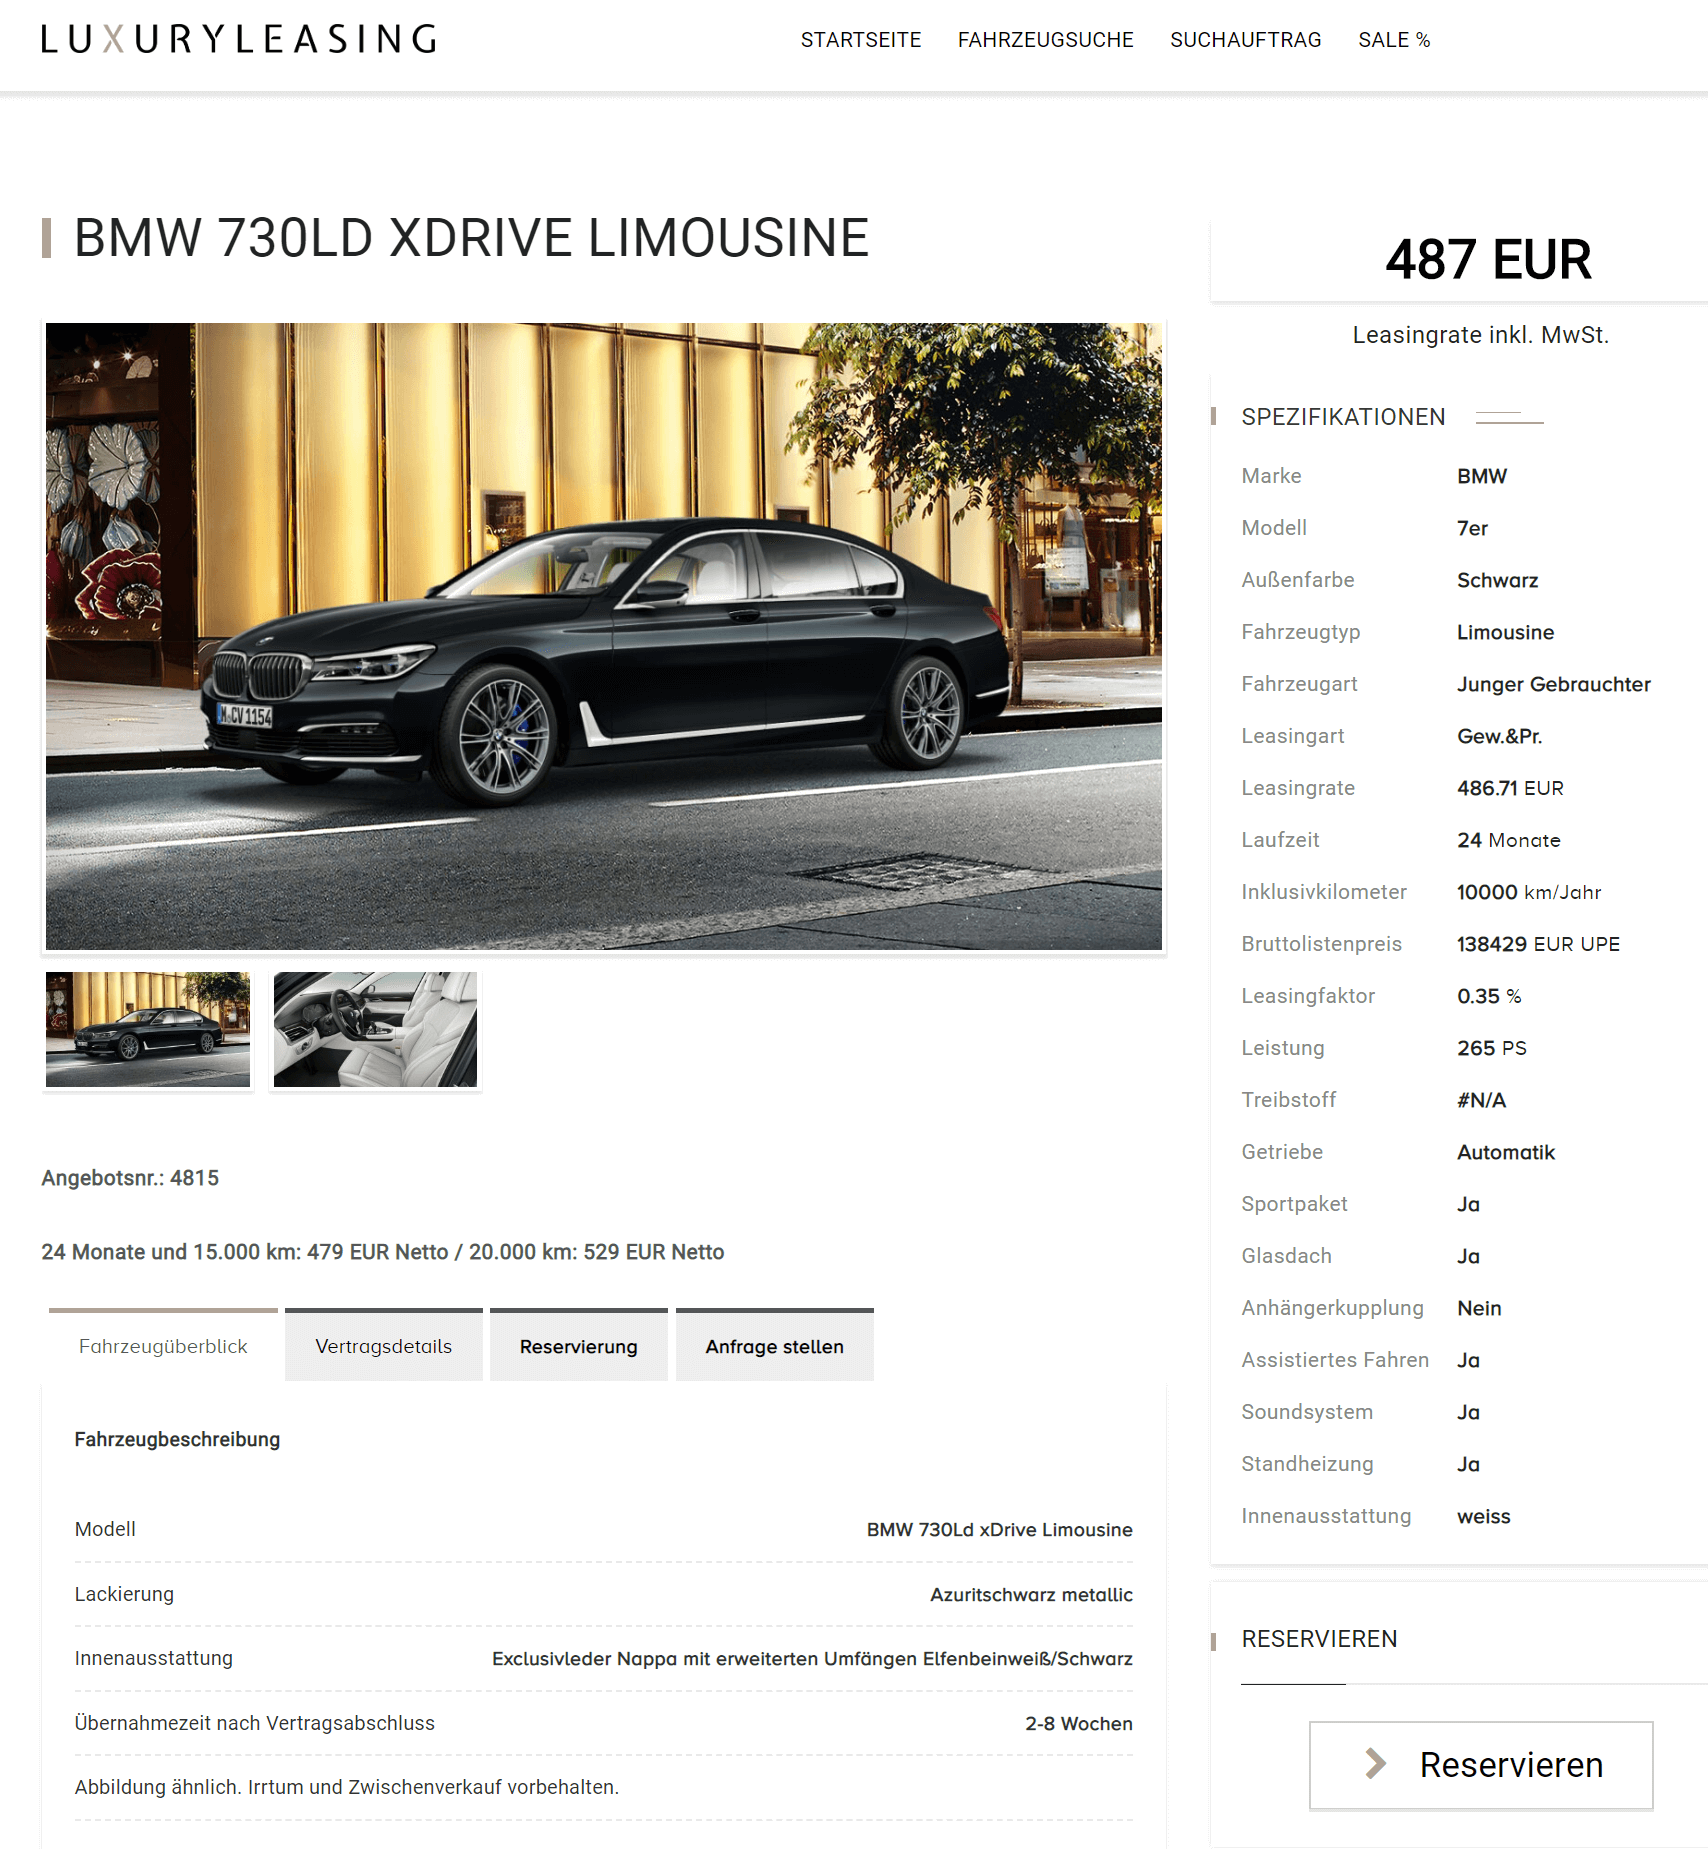 bmw 7er langversion aktion bei luxuryleasing leasing f r 486 71 euro im monat brutto. Black Bedroom Furniture Sets. Home Design Ideas